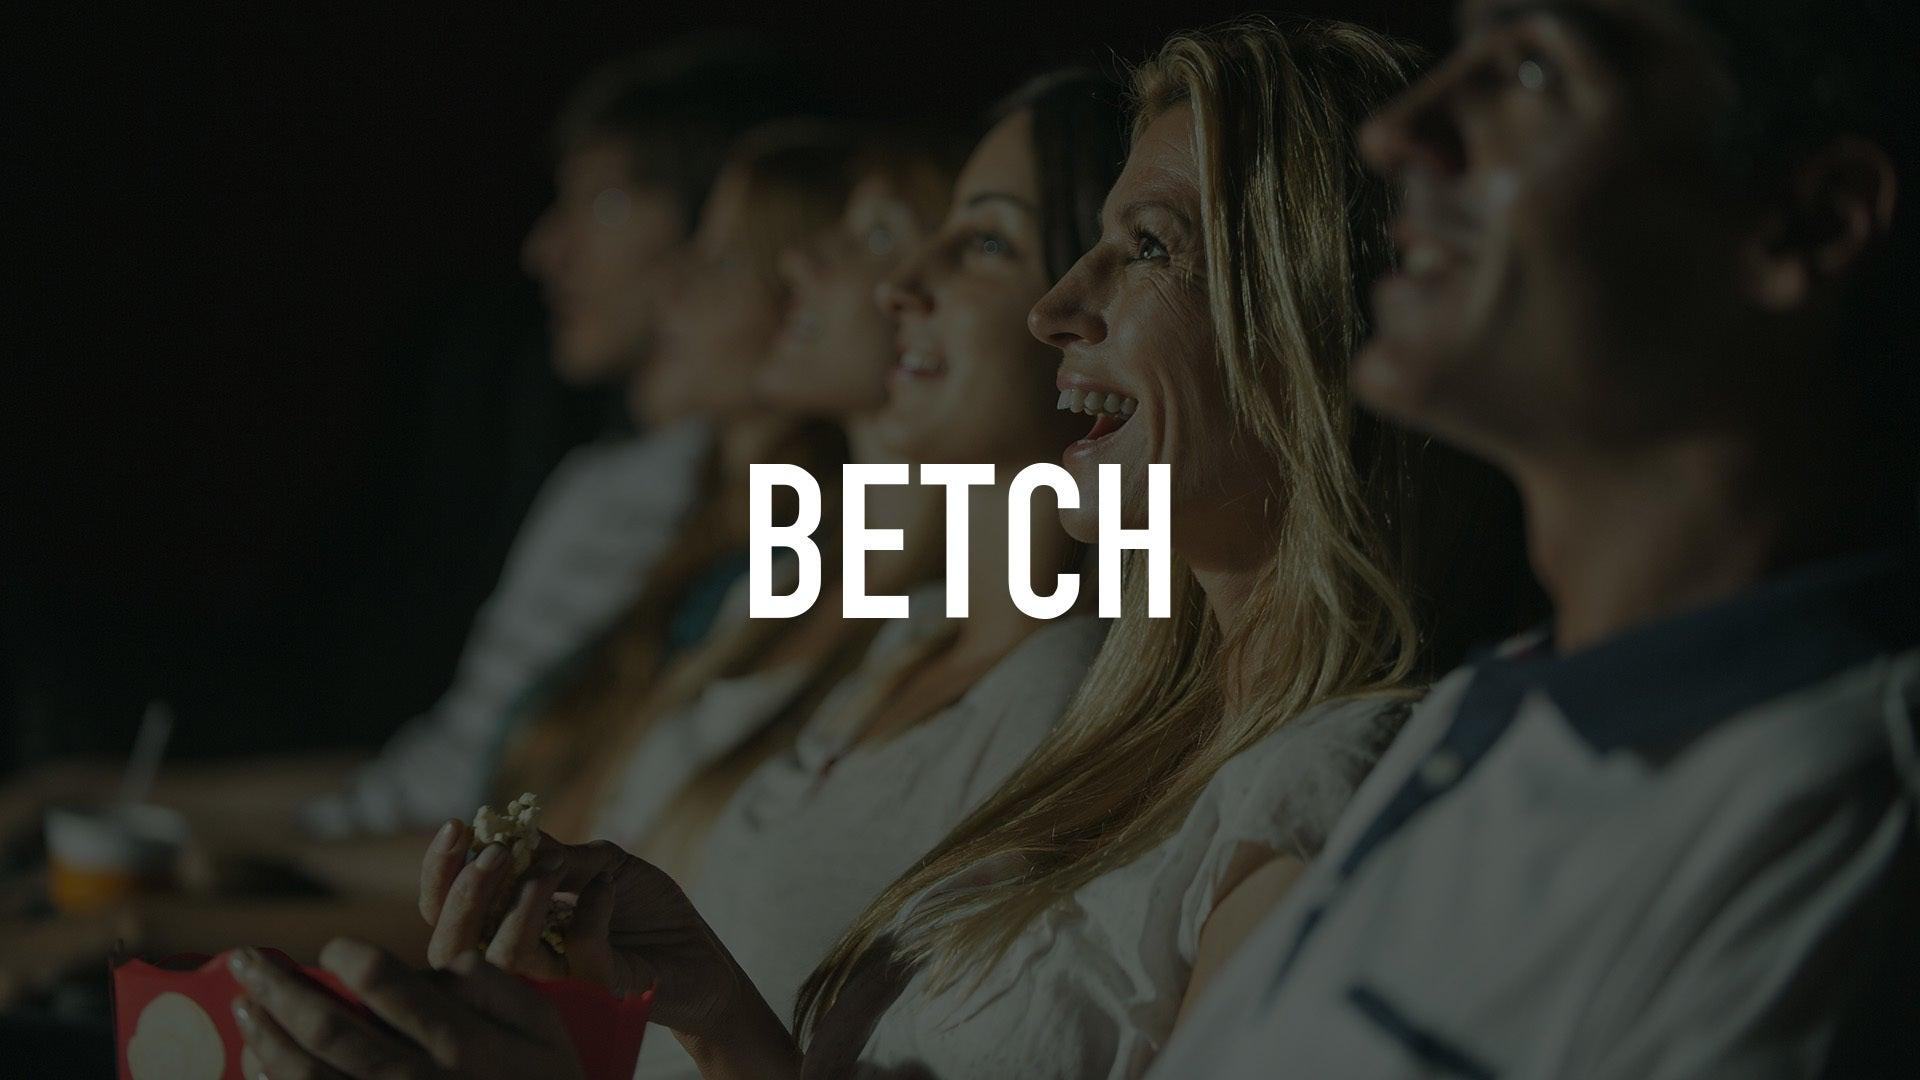 Betch